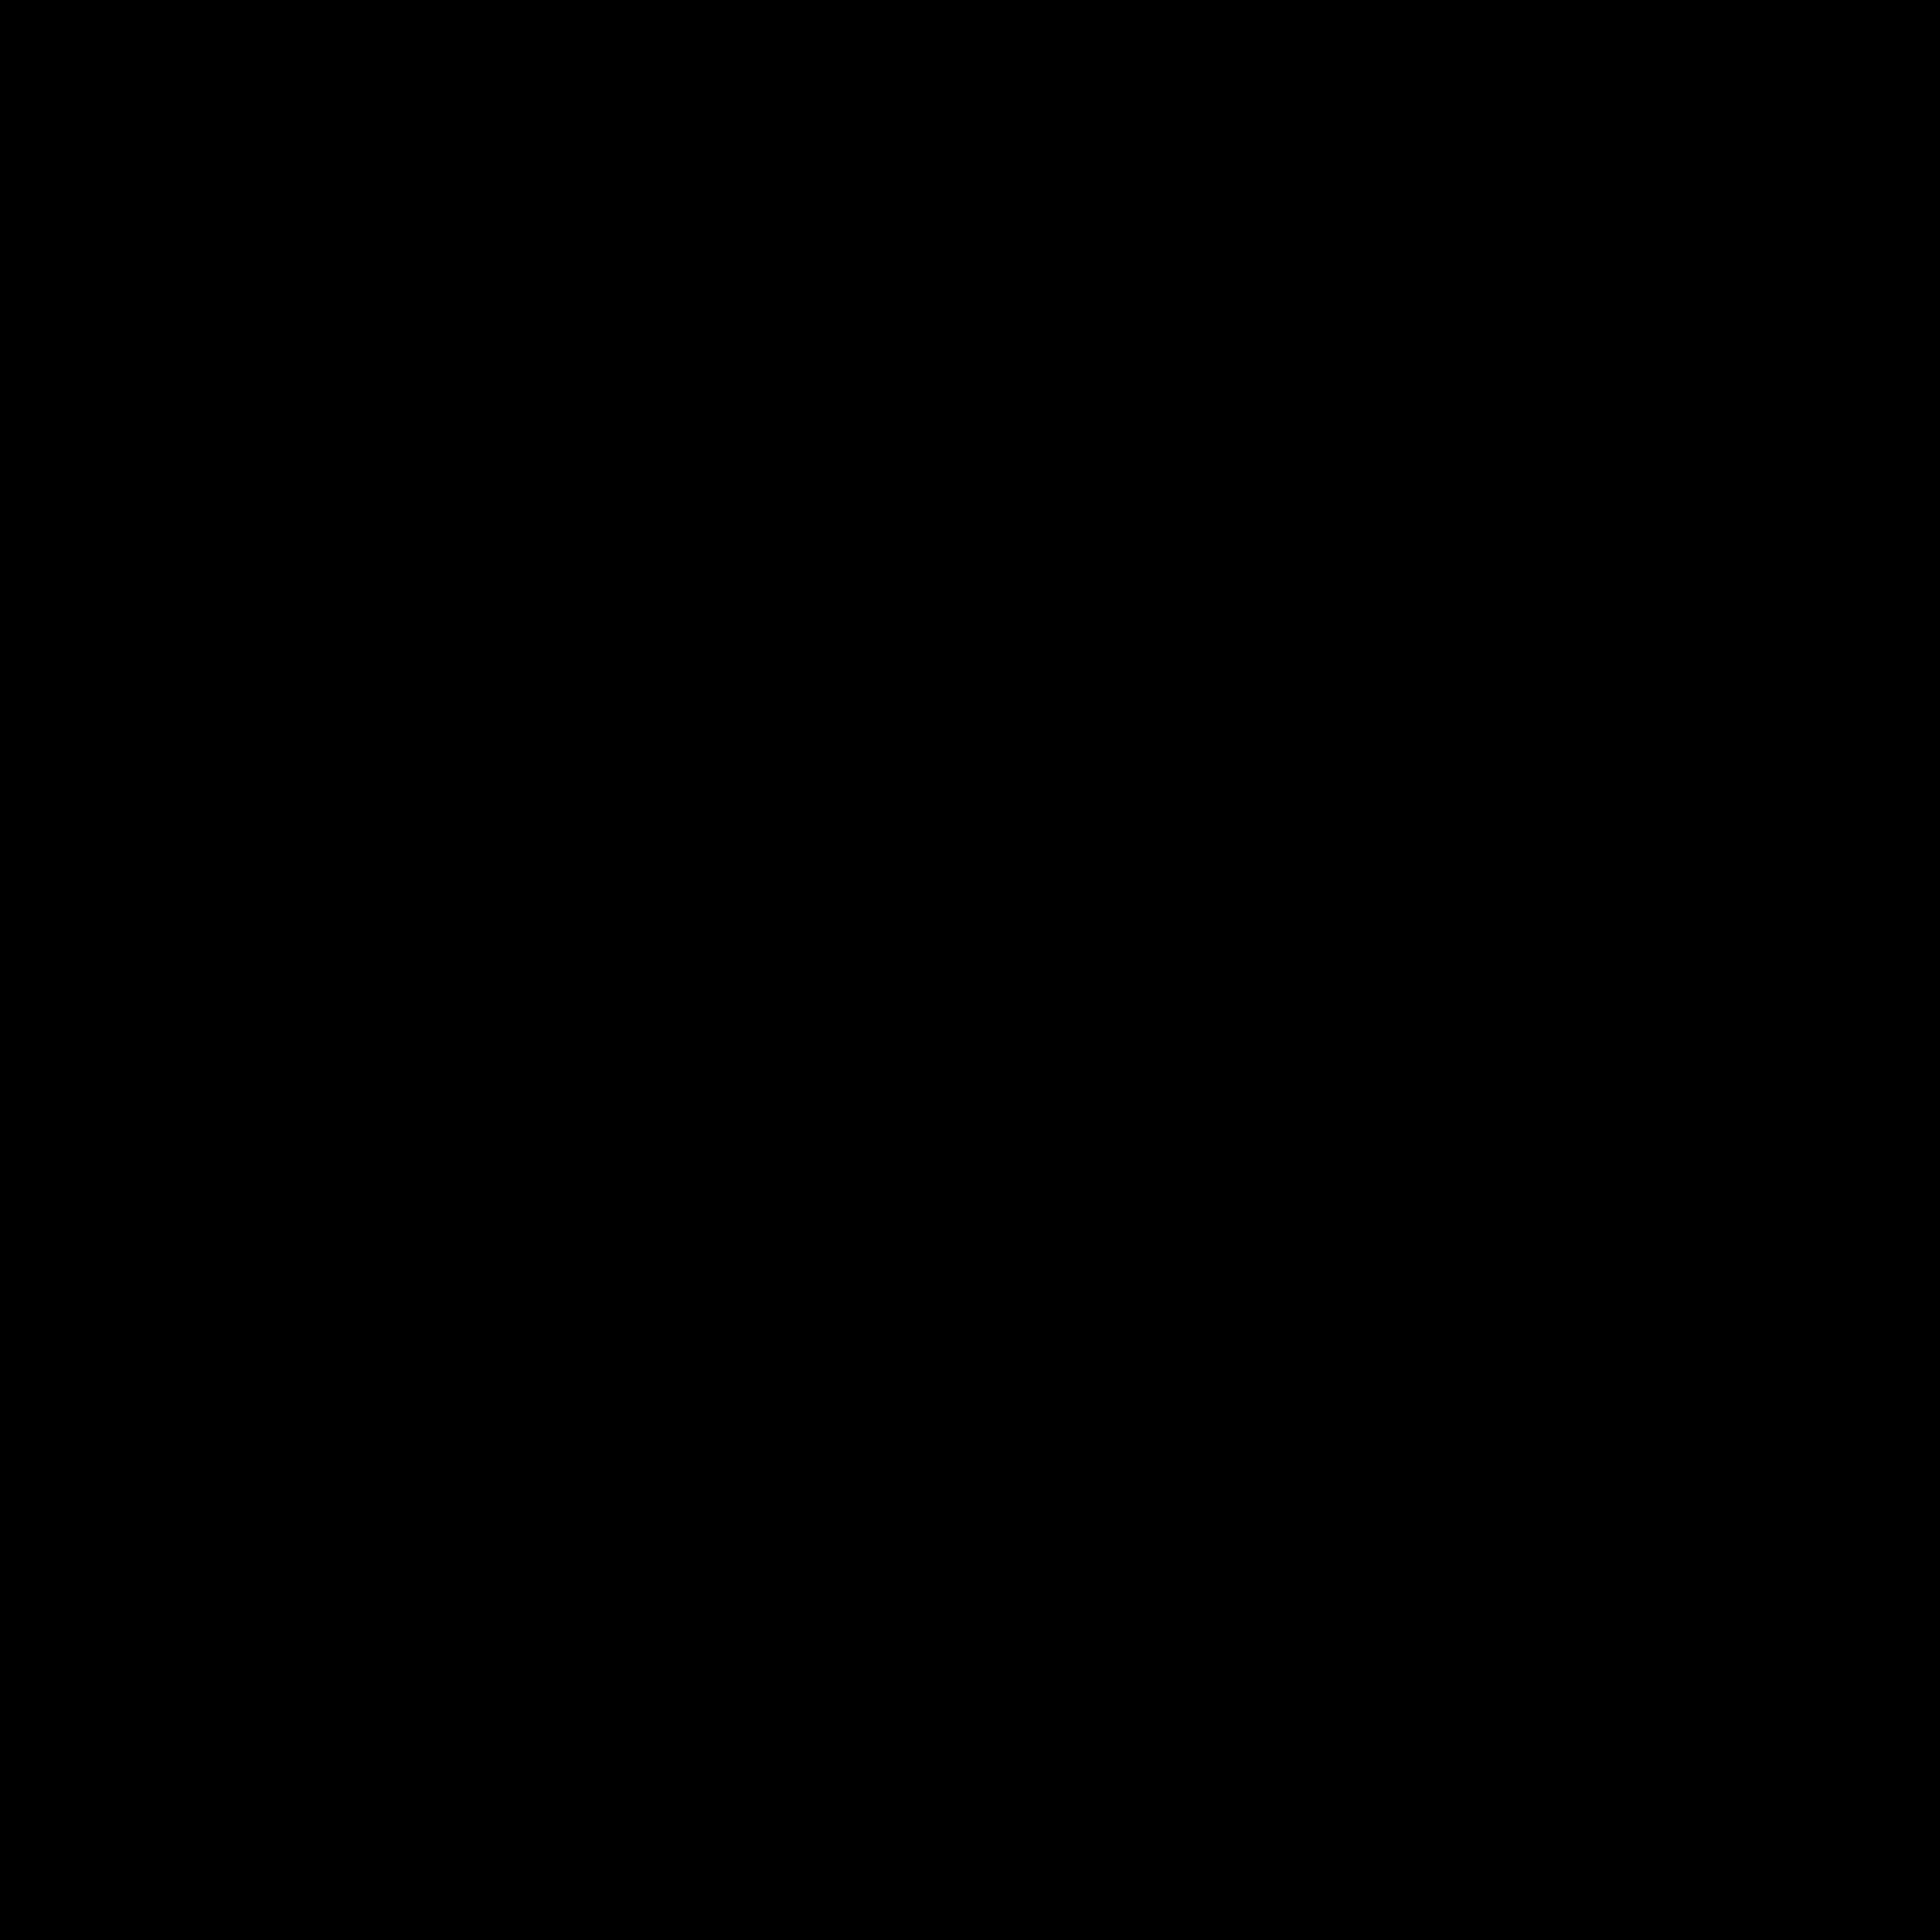 University of Alberta Logo PNG Transparent & SVG Vector.